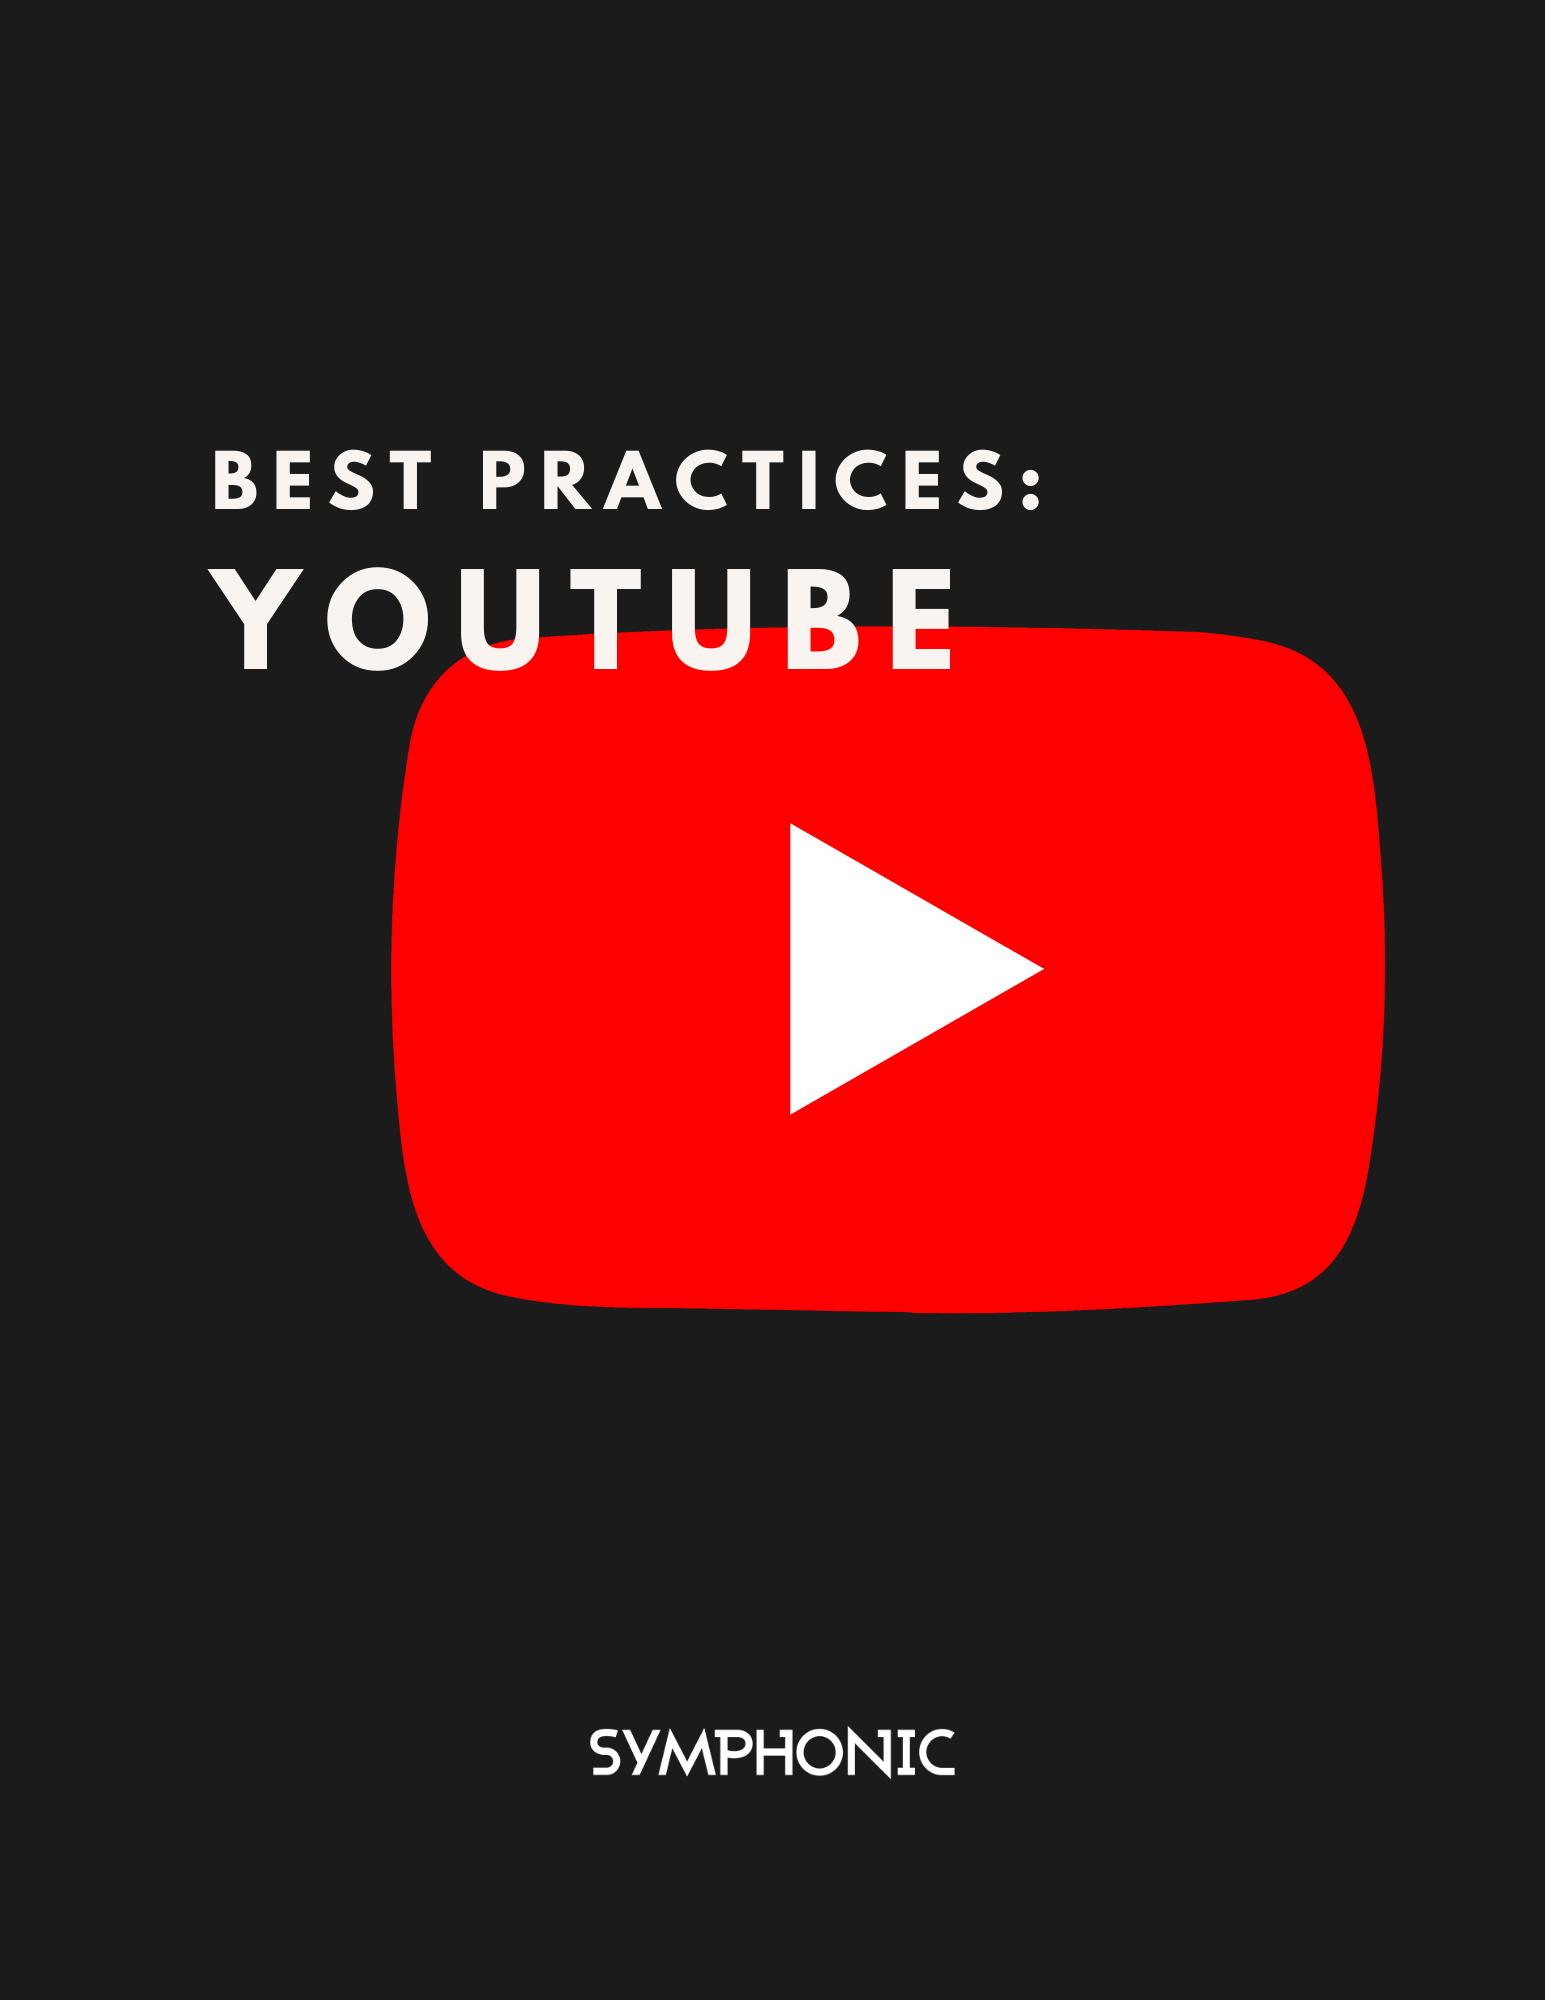 Best Practices YouTube